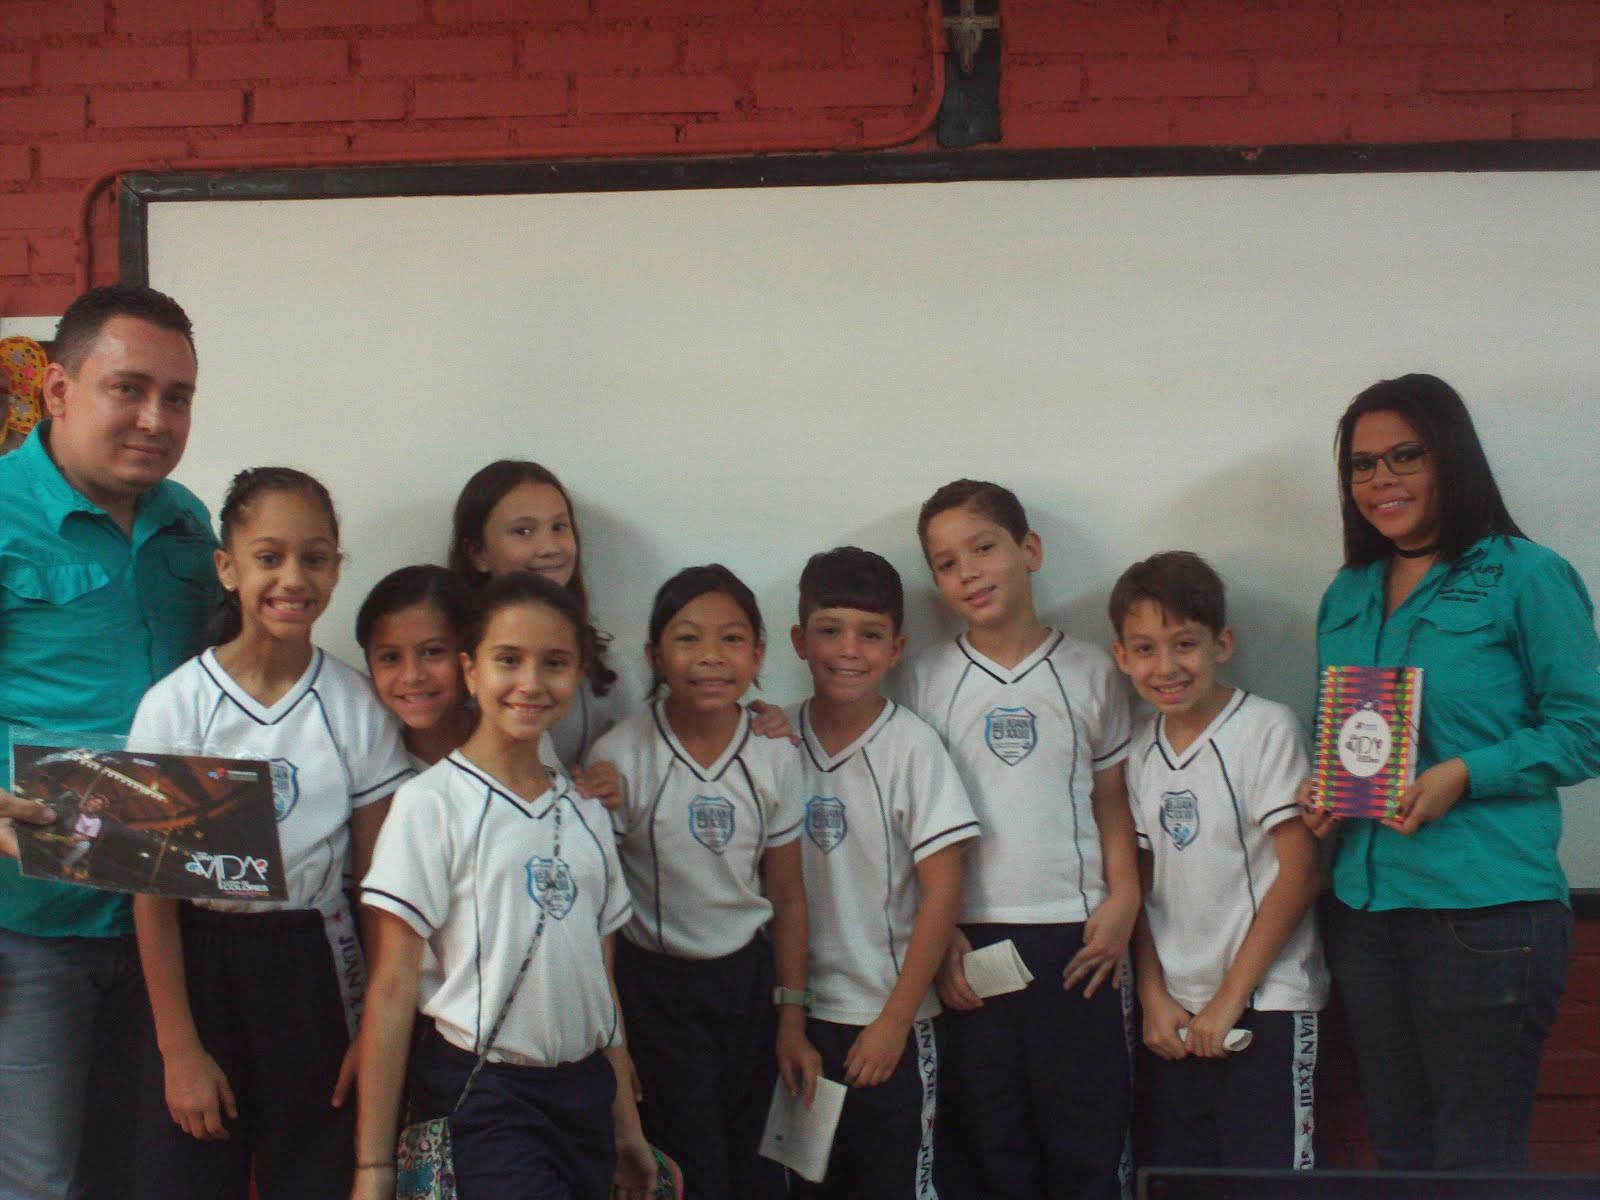 Charla Colegio Juan XXIII Sede Juanito